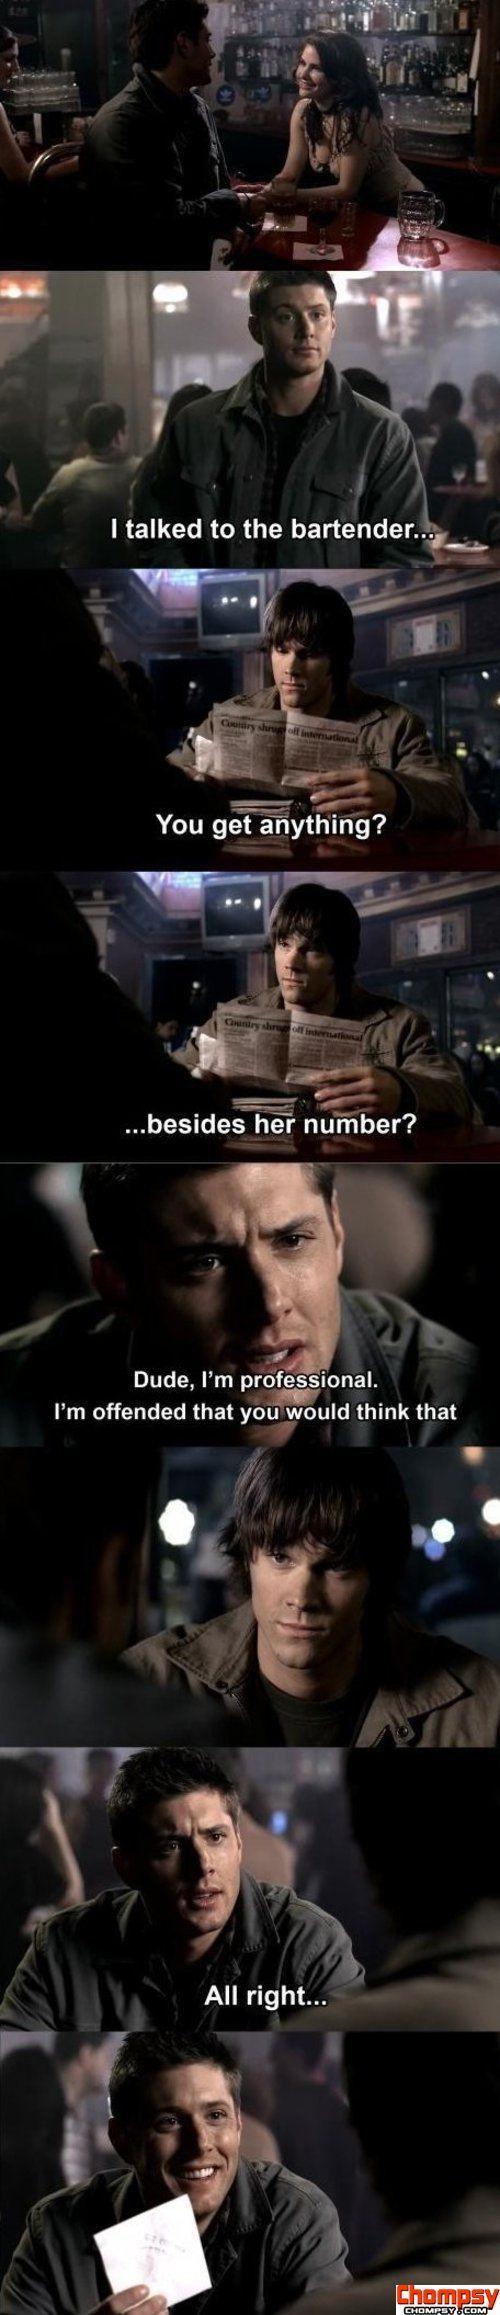 Funny Dean Winchester